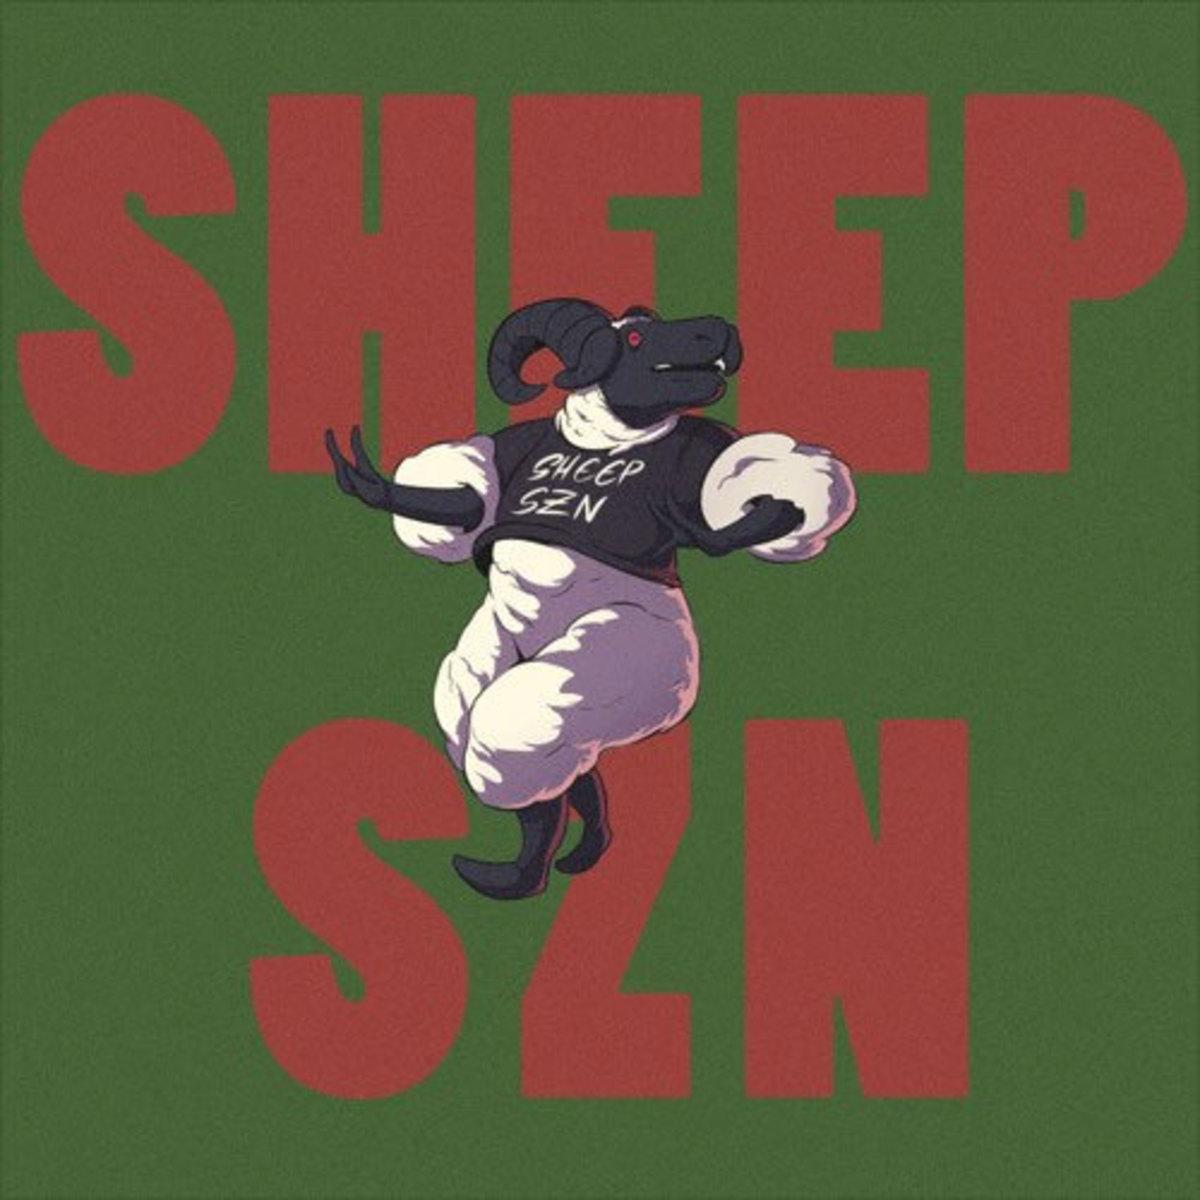 curbside-jones-sheep-szn.jpg